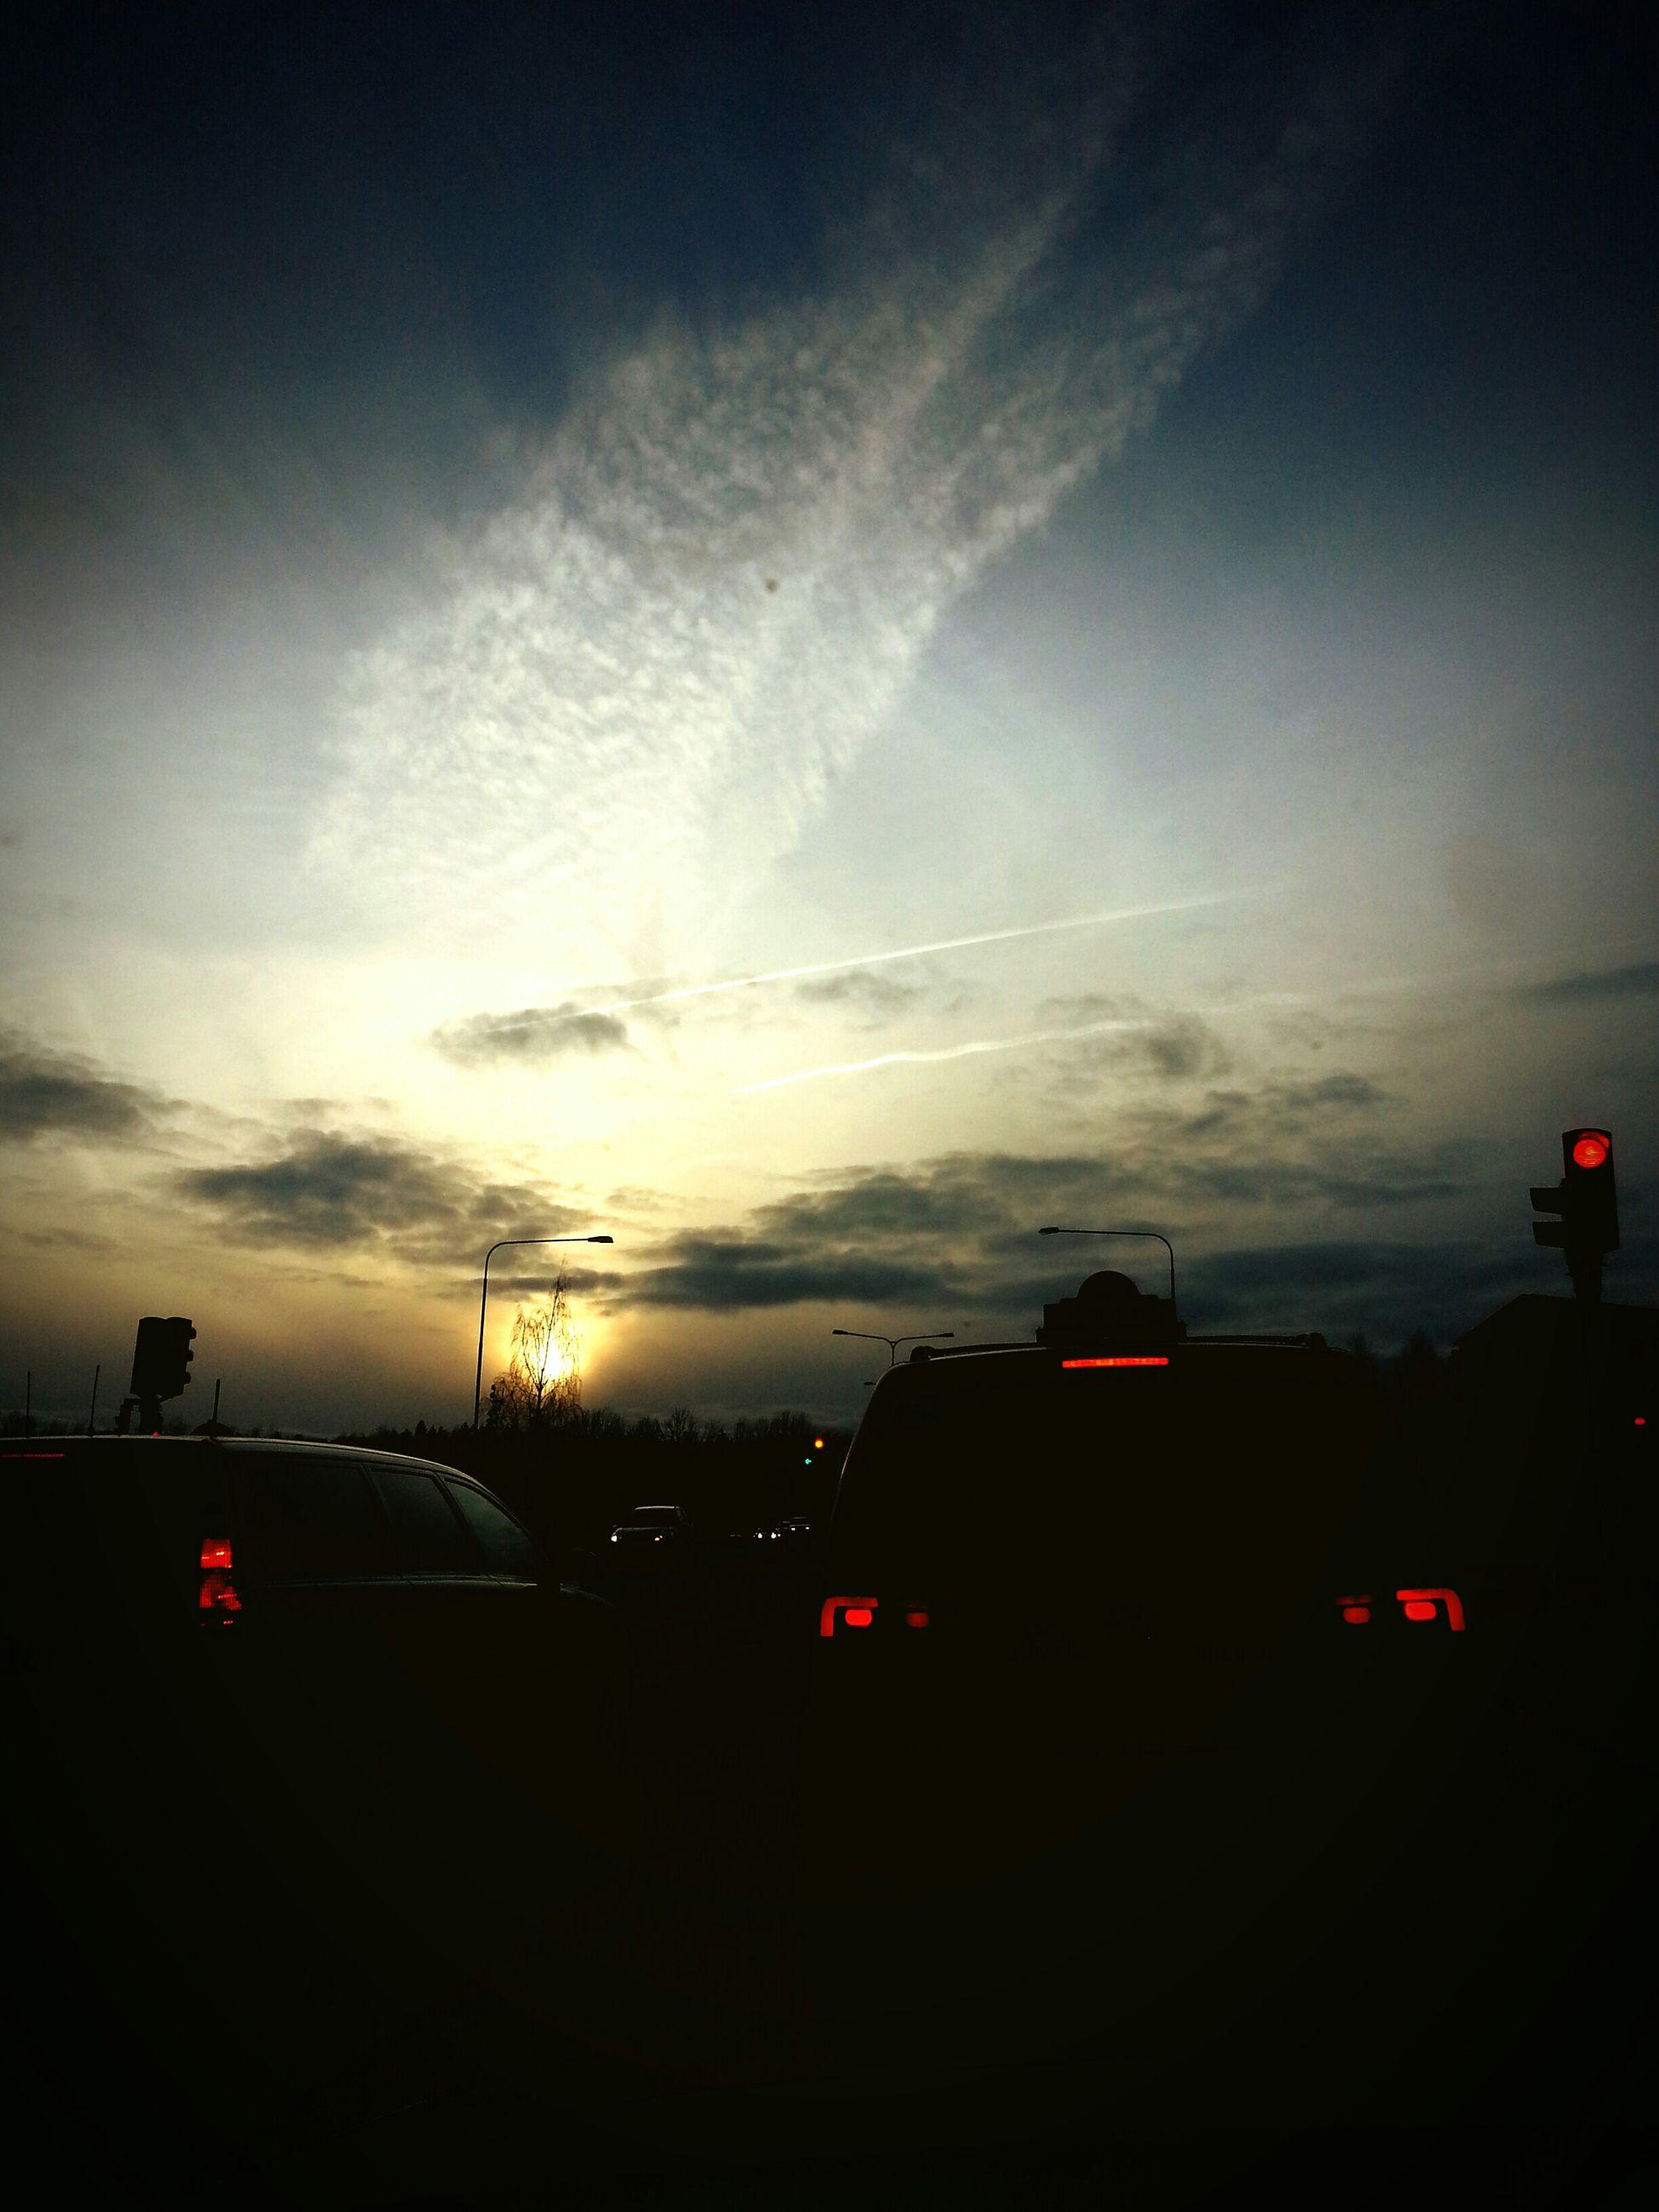 transportation, sunset, sky, car, silhouette, land vehicle, mode of transport, cloud - sky, road, building exterior, street, built structure, nature, dusk, outdoors, street light, architecture, no people, sun, cloud